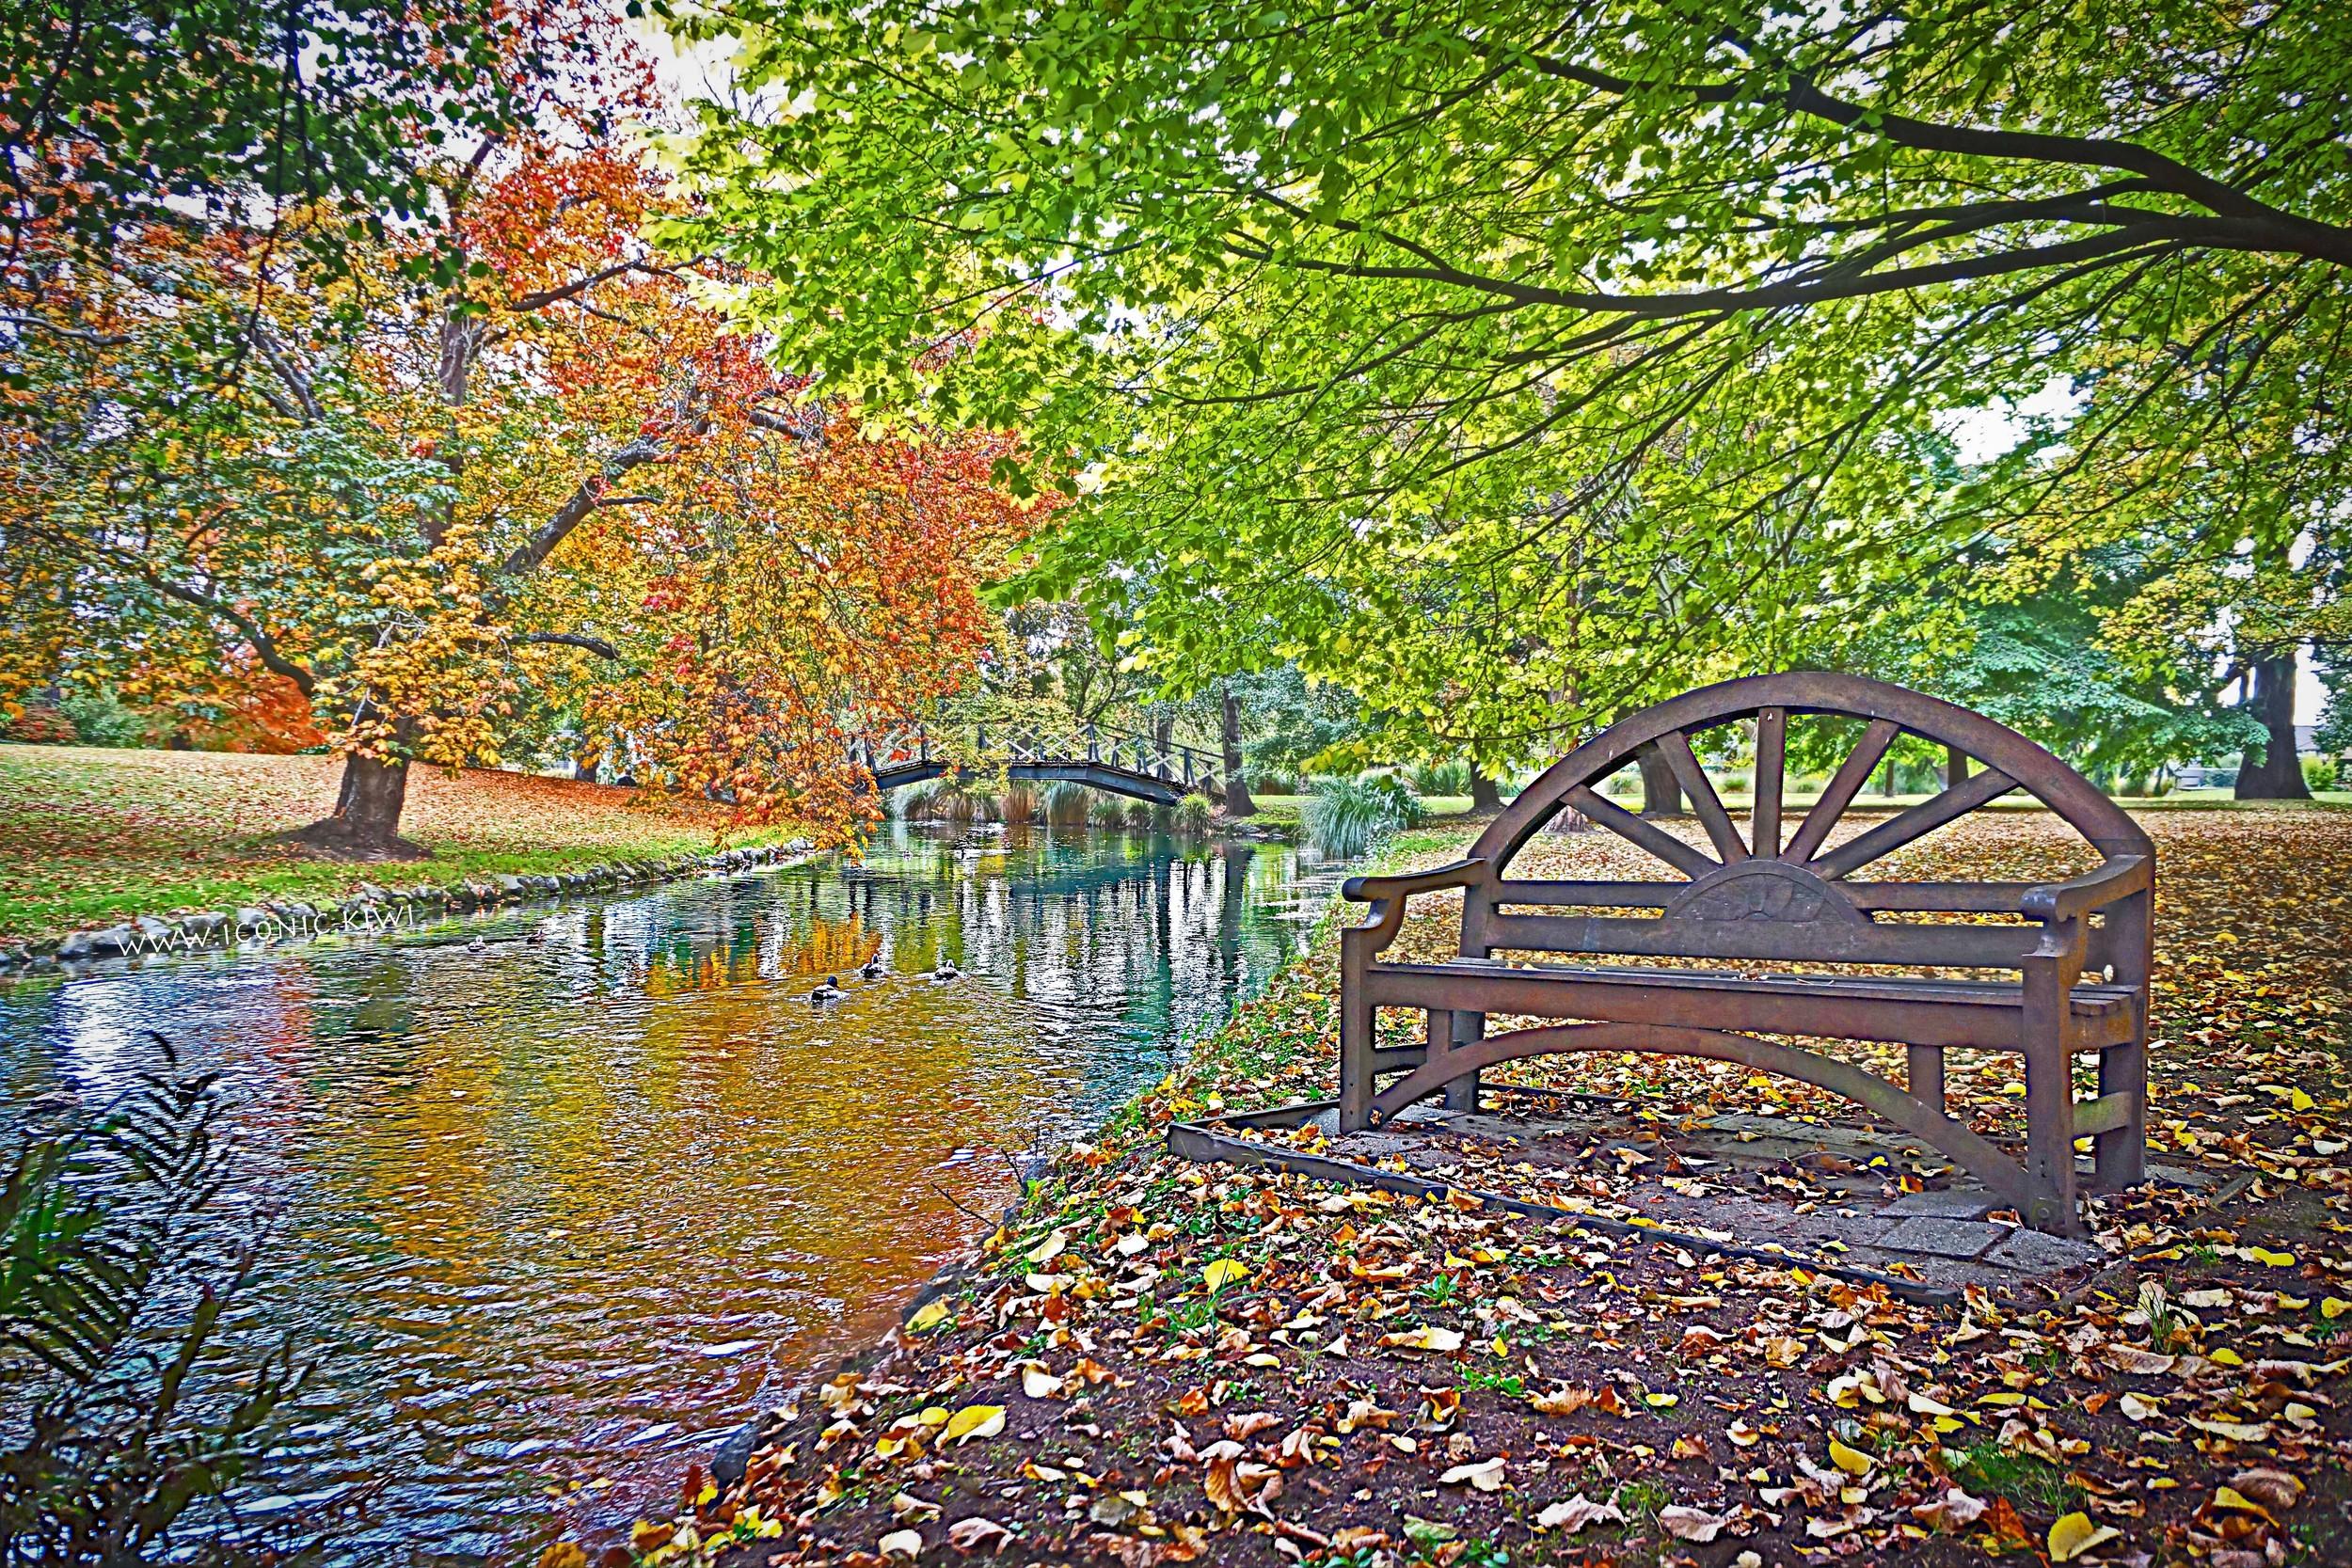 A tranquil autumn walk in Mona Vale park, Christchurch